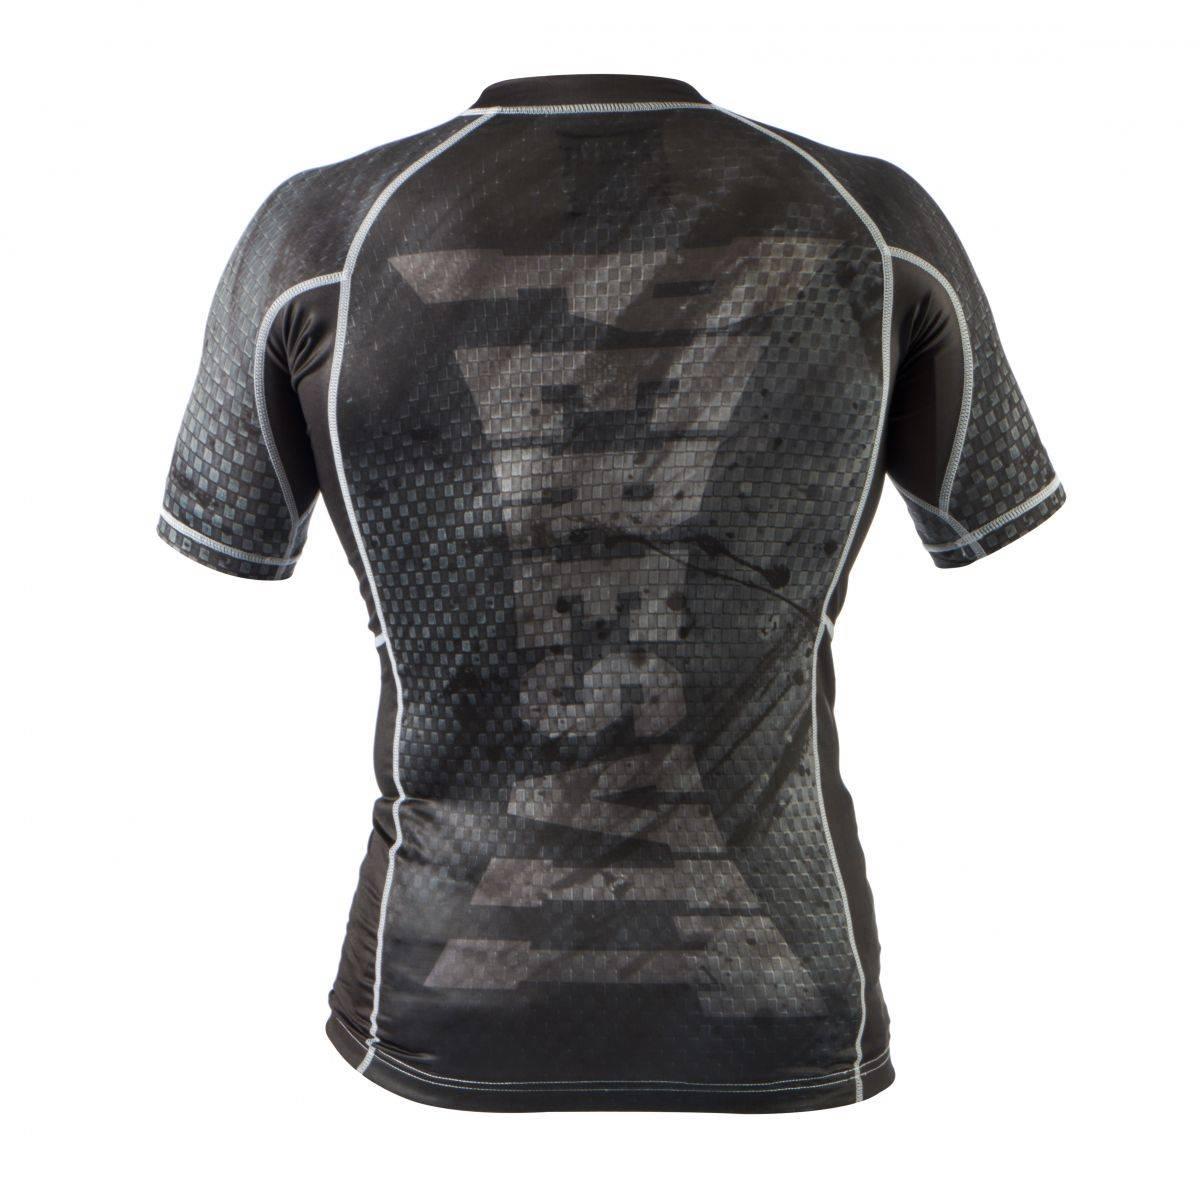 Компрессионная футболка Peresvit Beast Silver Force Black-S